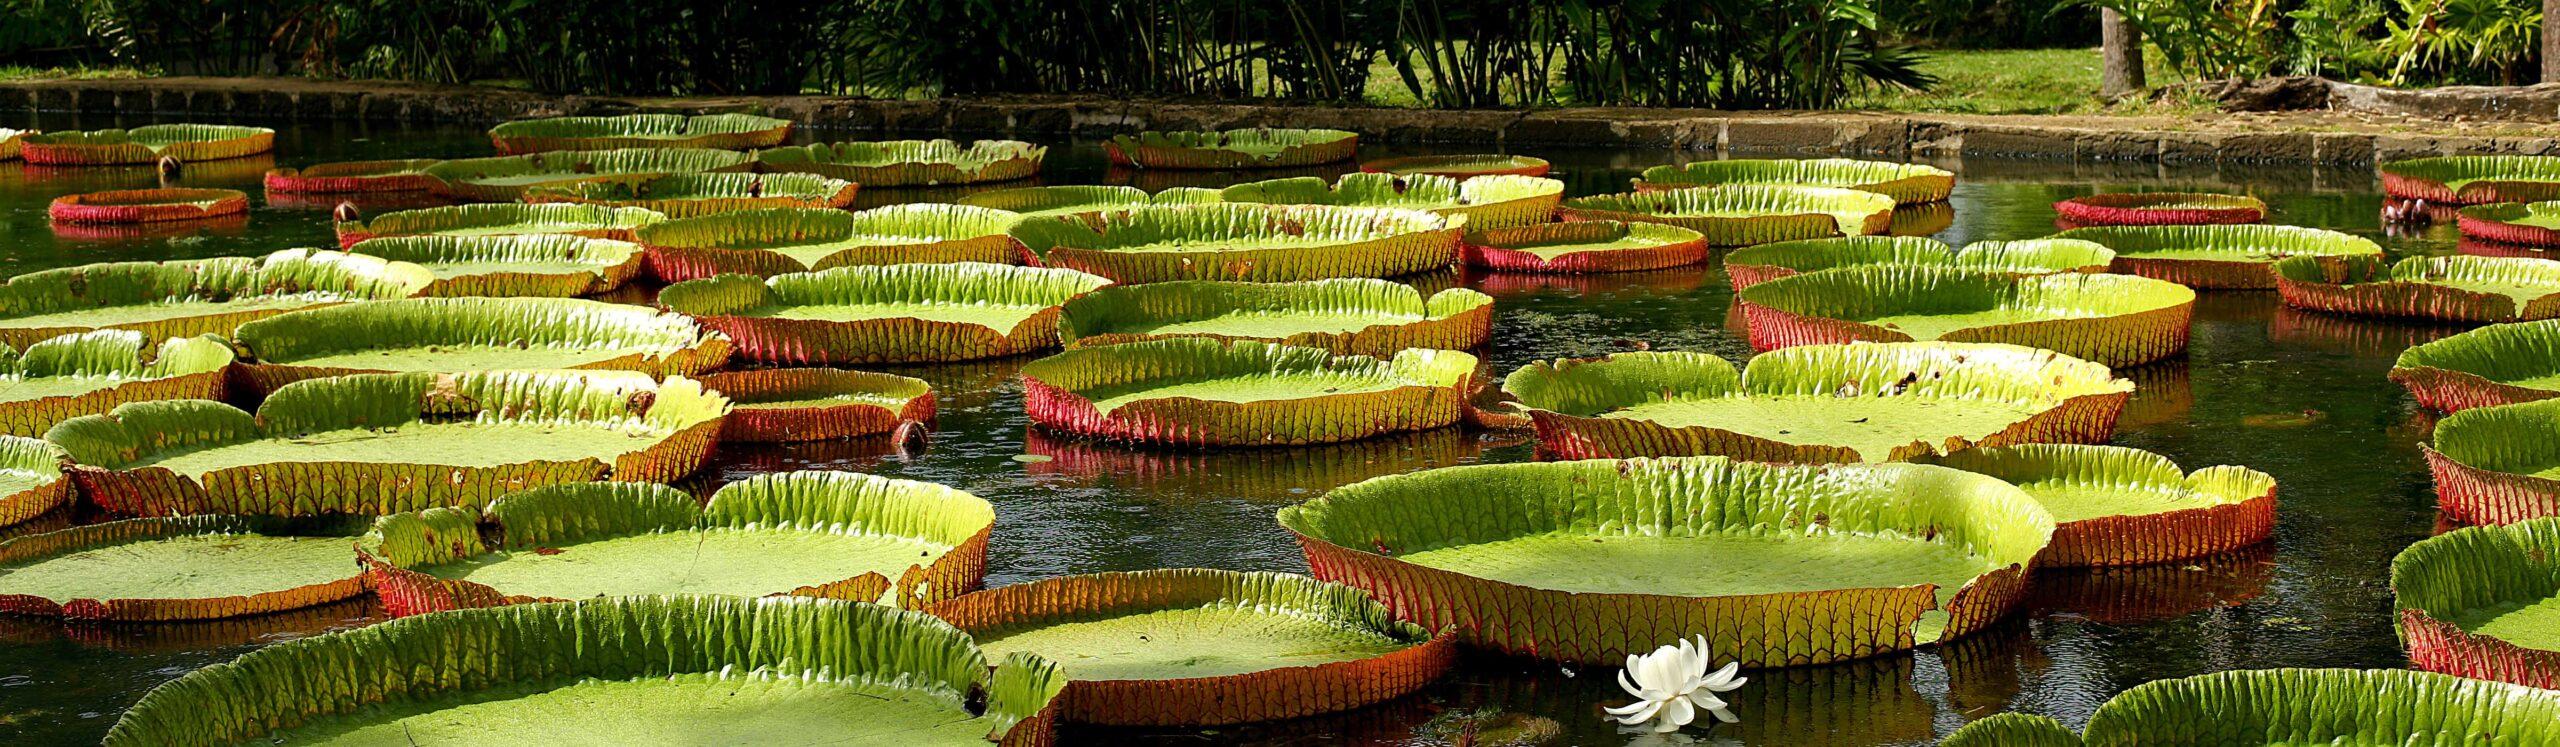 Giant Victoria Water lilies at Kanapaha Botanical Gardens